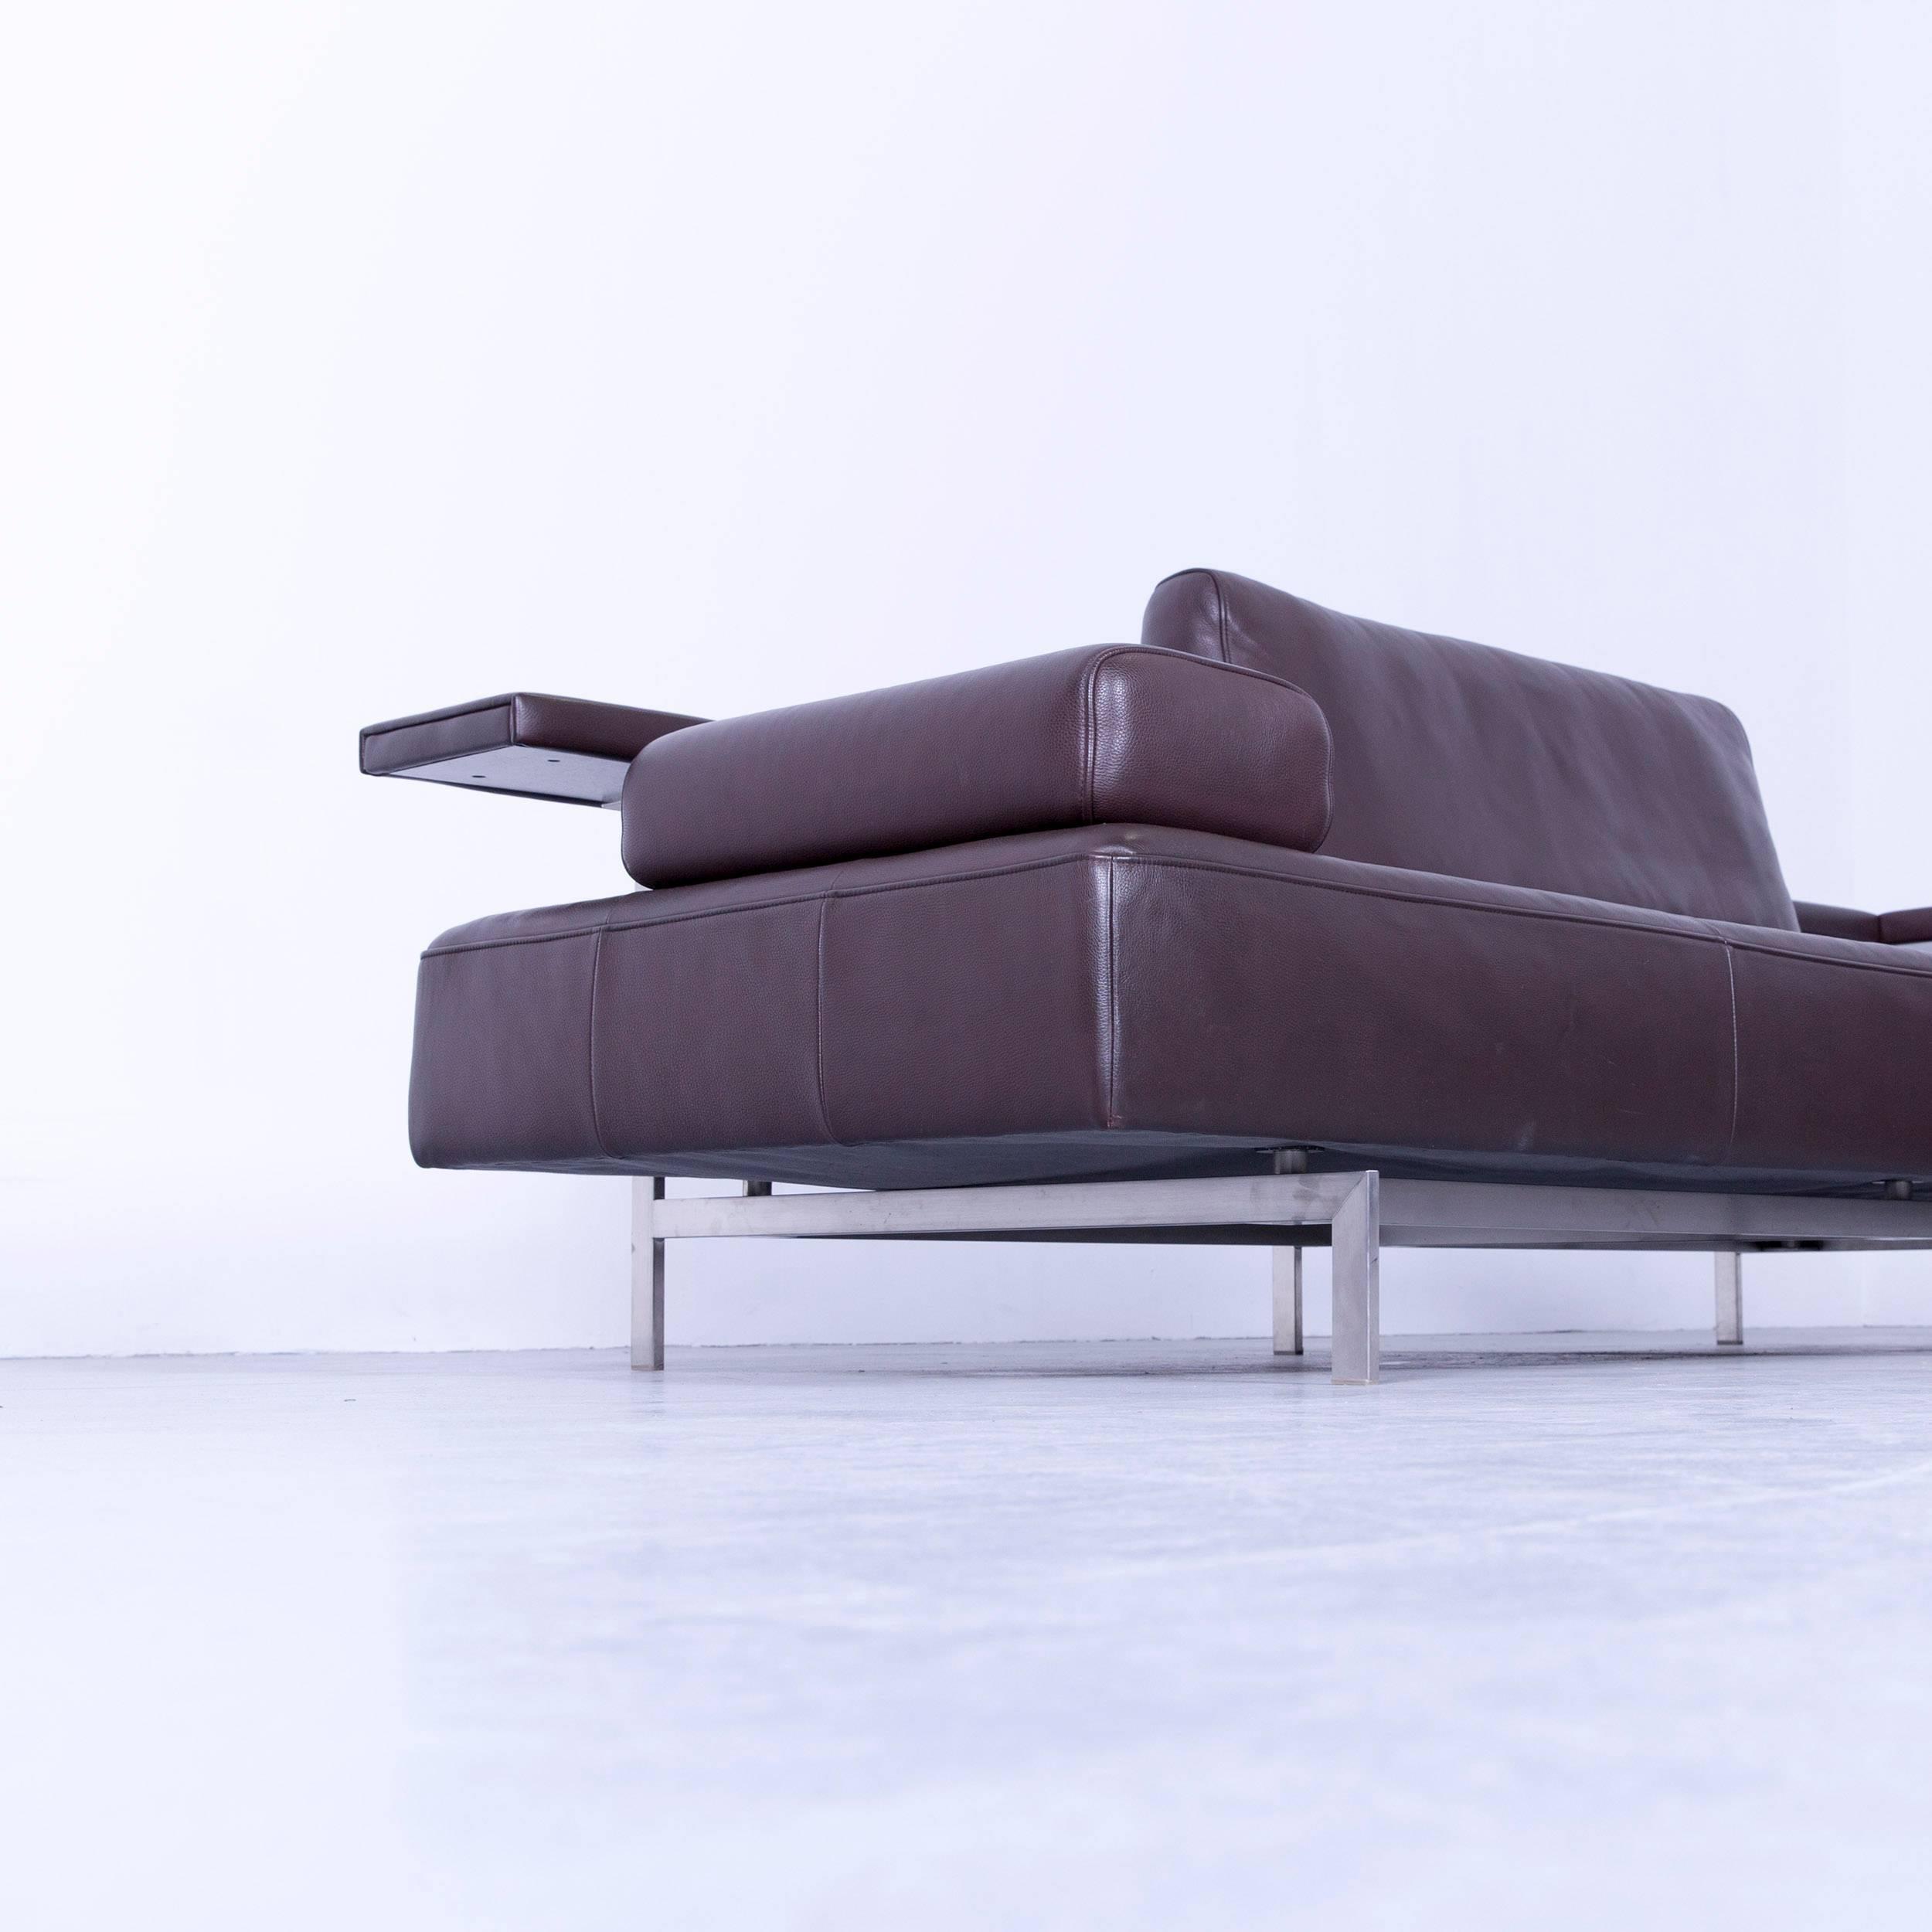 Various Sessel Modern Design Decoration Of Dono Modular Sofa Rolf Benz. Modren Sofa